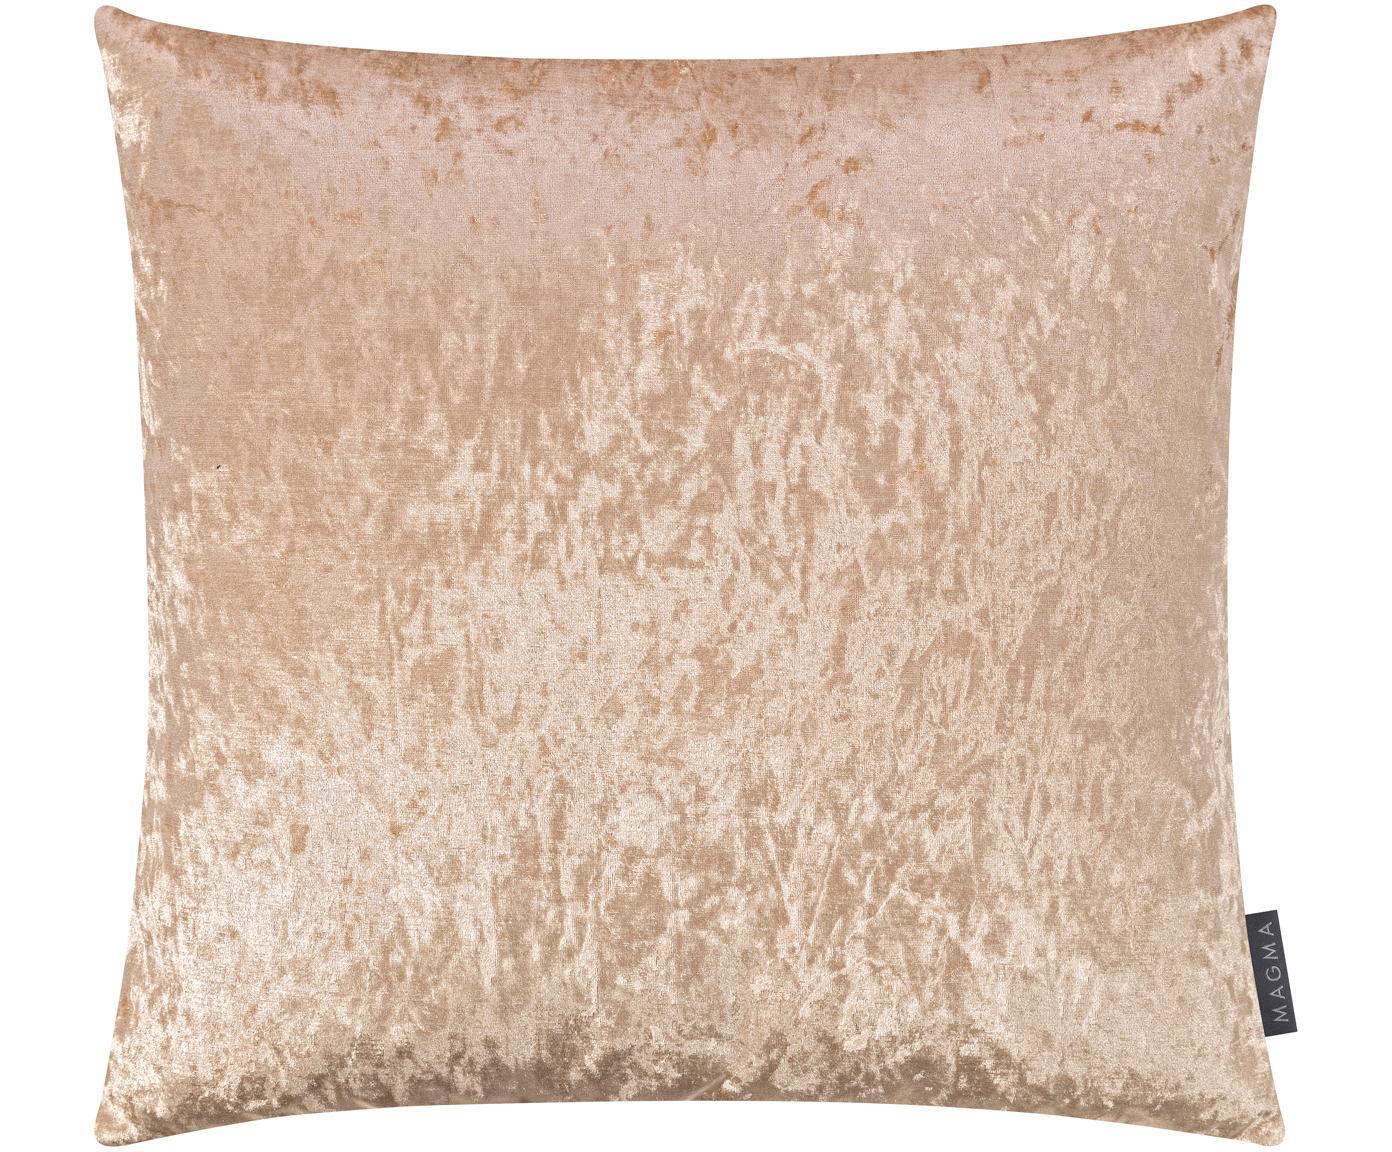 Fluwelen kussenhoes Shanta met glinsterende vintage patroon, 100% polyester fluweel, Champagnekleurig, 40 x 40 cm